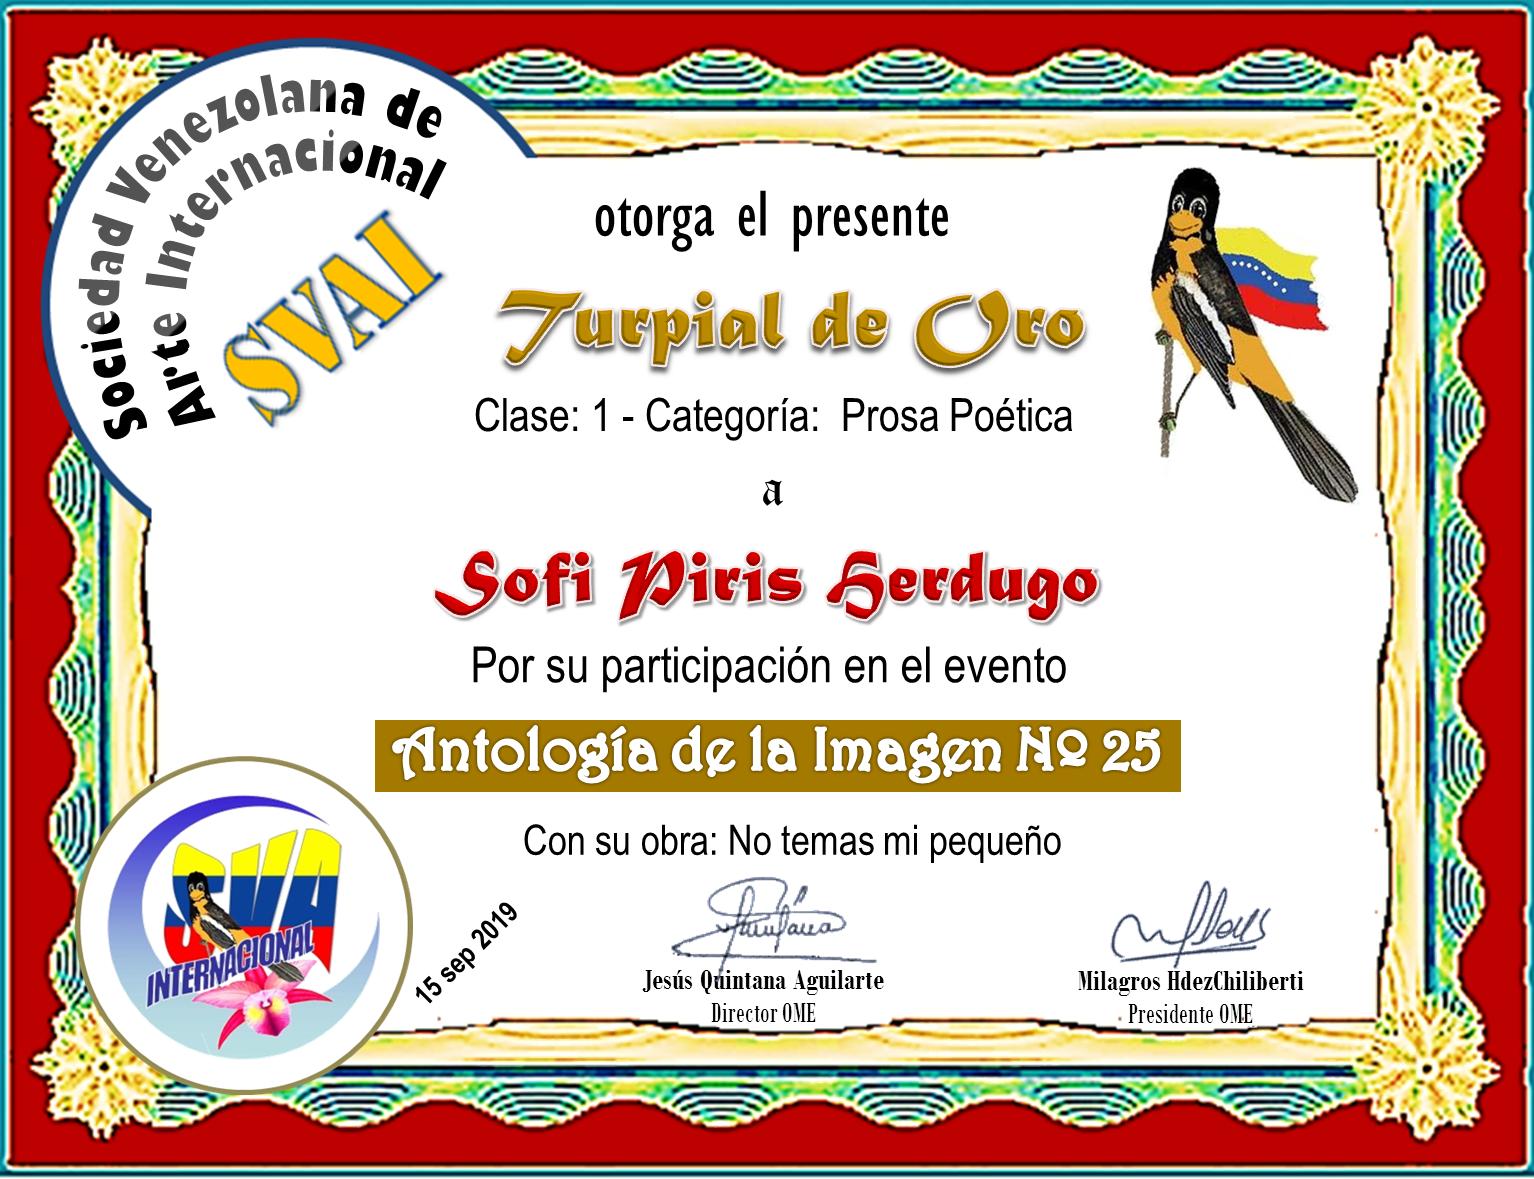 SOFI PIRIS HERDUGO